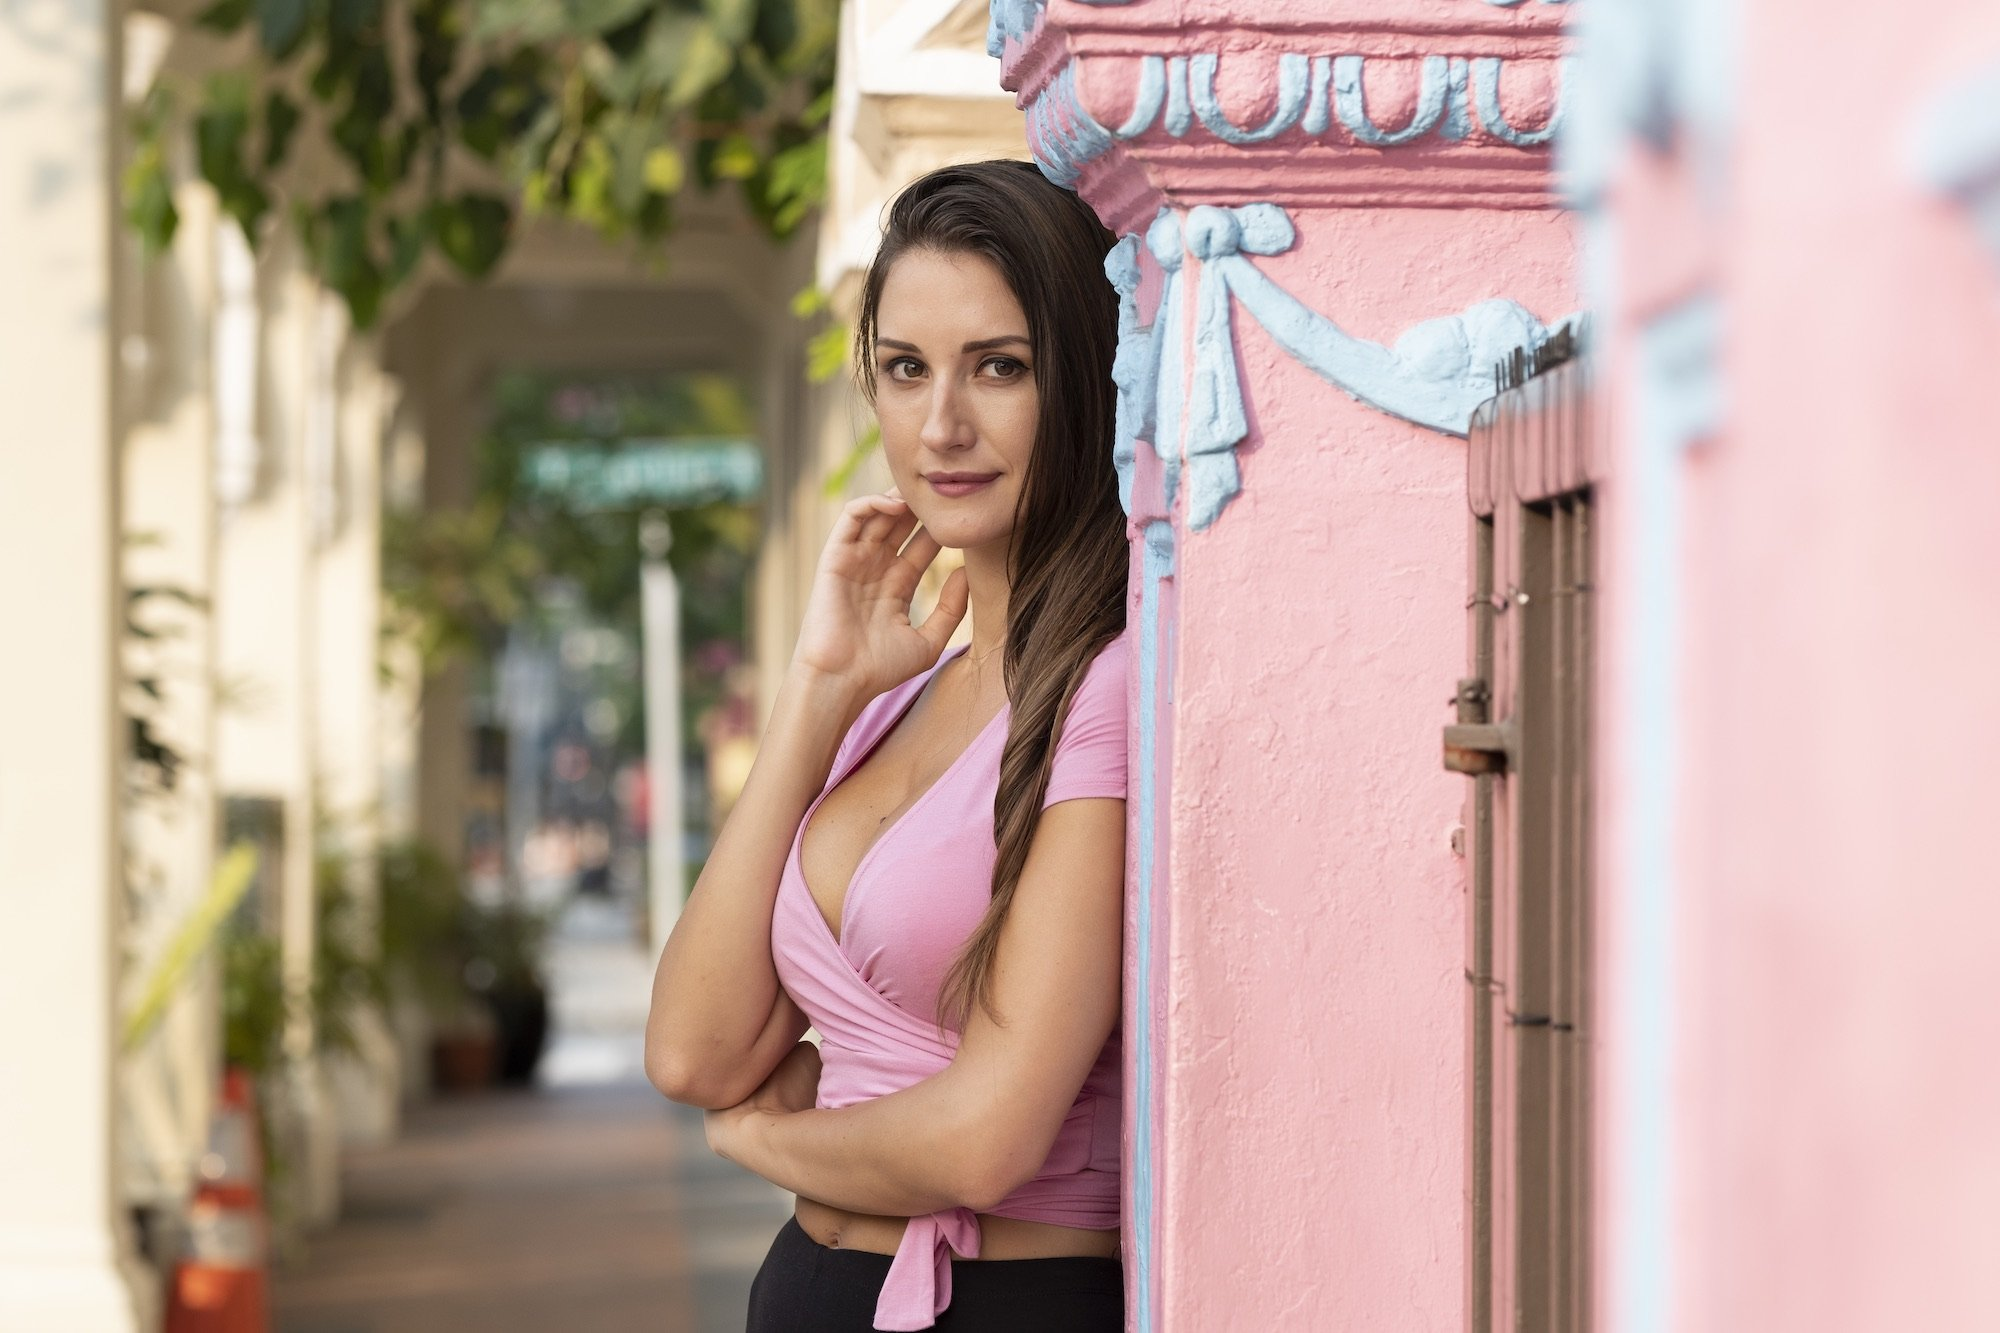 Fashion Photography Pink Model Outdoors Shophouse Jose Jeuland 8